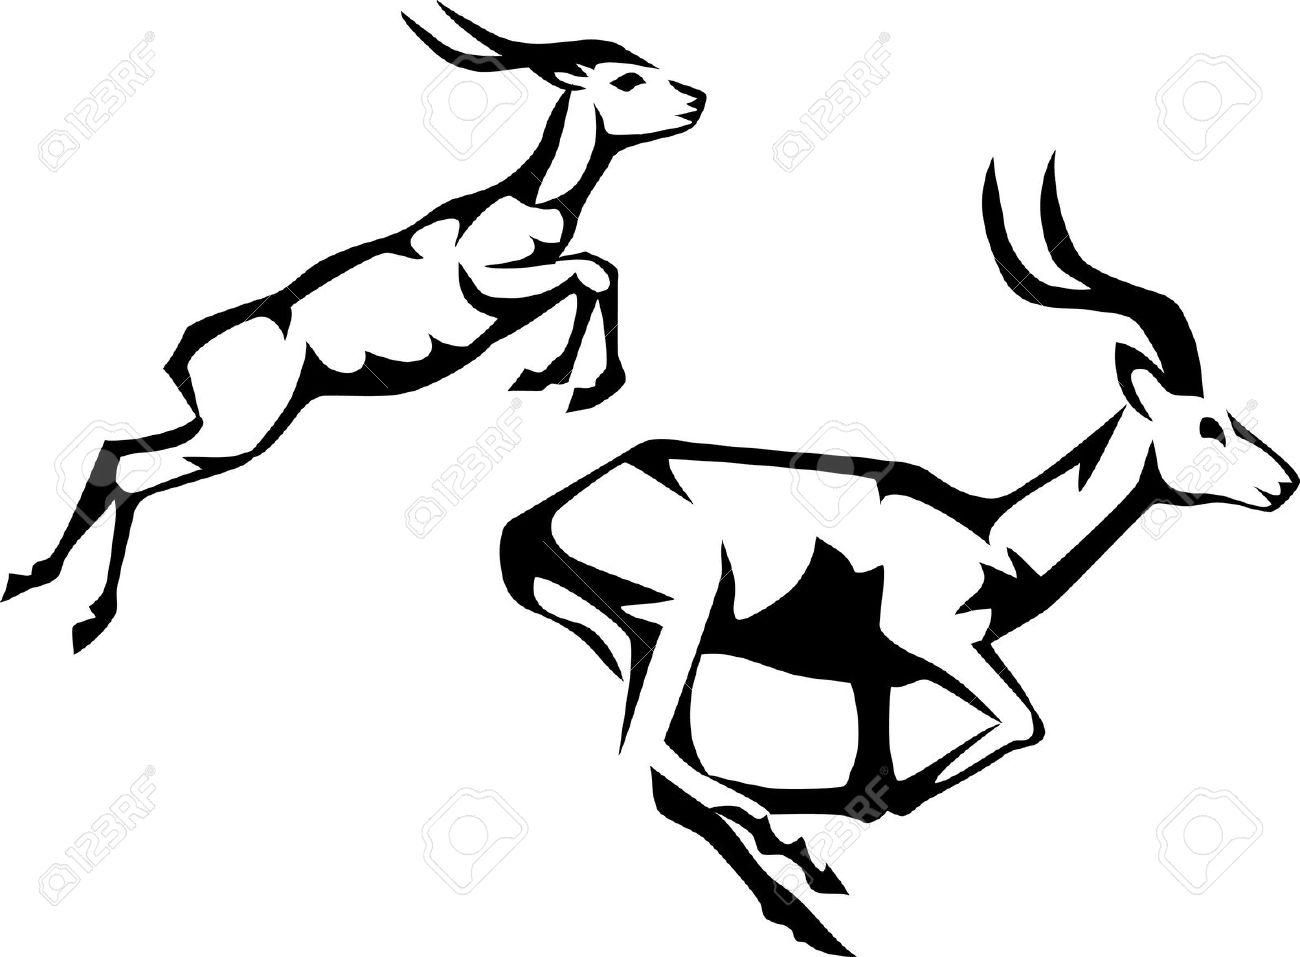 Gazelle Clipart Black And White.